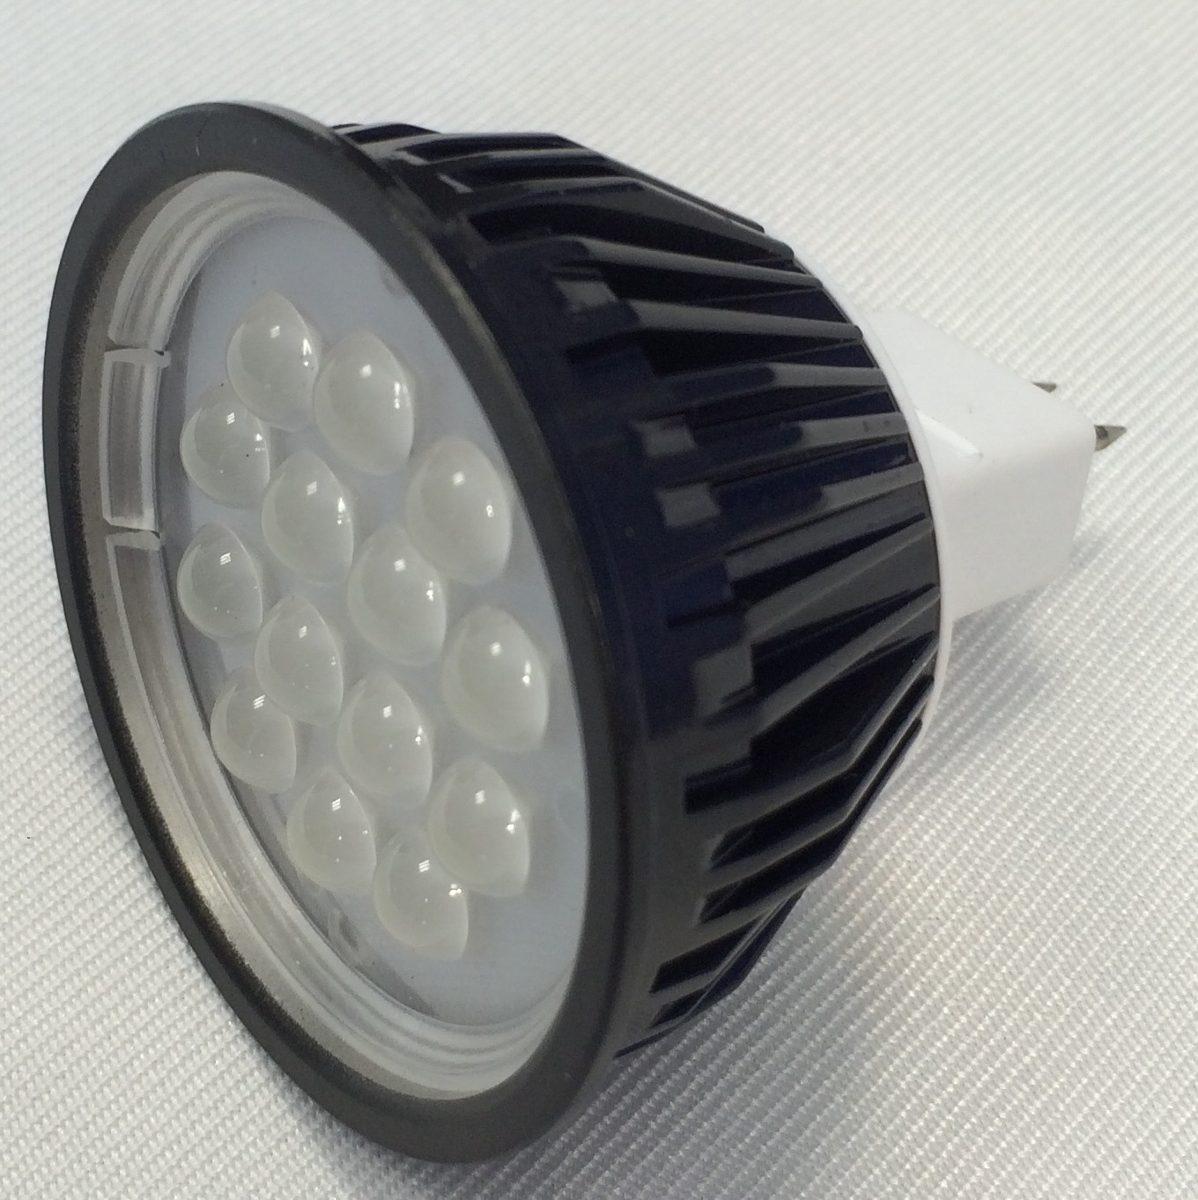 Foco led 3 watts mr16 gu5 3 gx5 3 empotrable spot lampara - Foco led empotrable ...